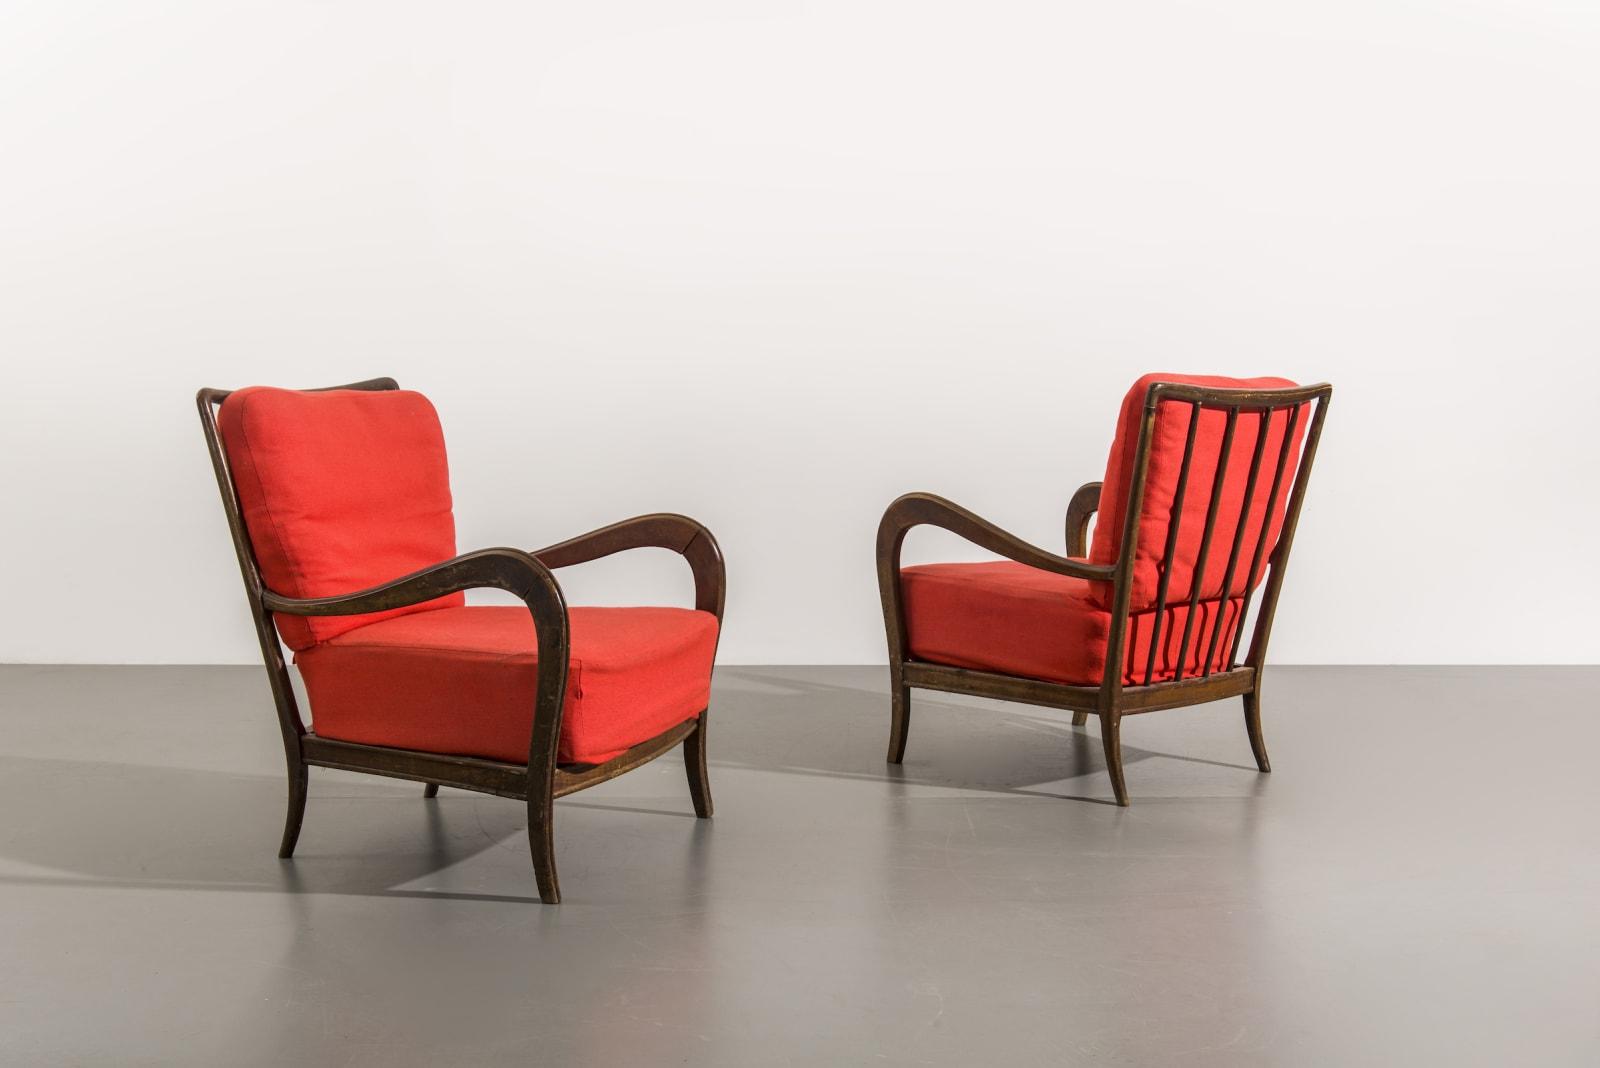 Italian, Pair of armchairs